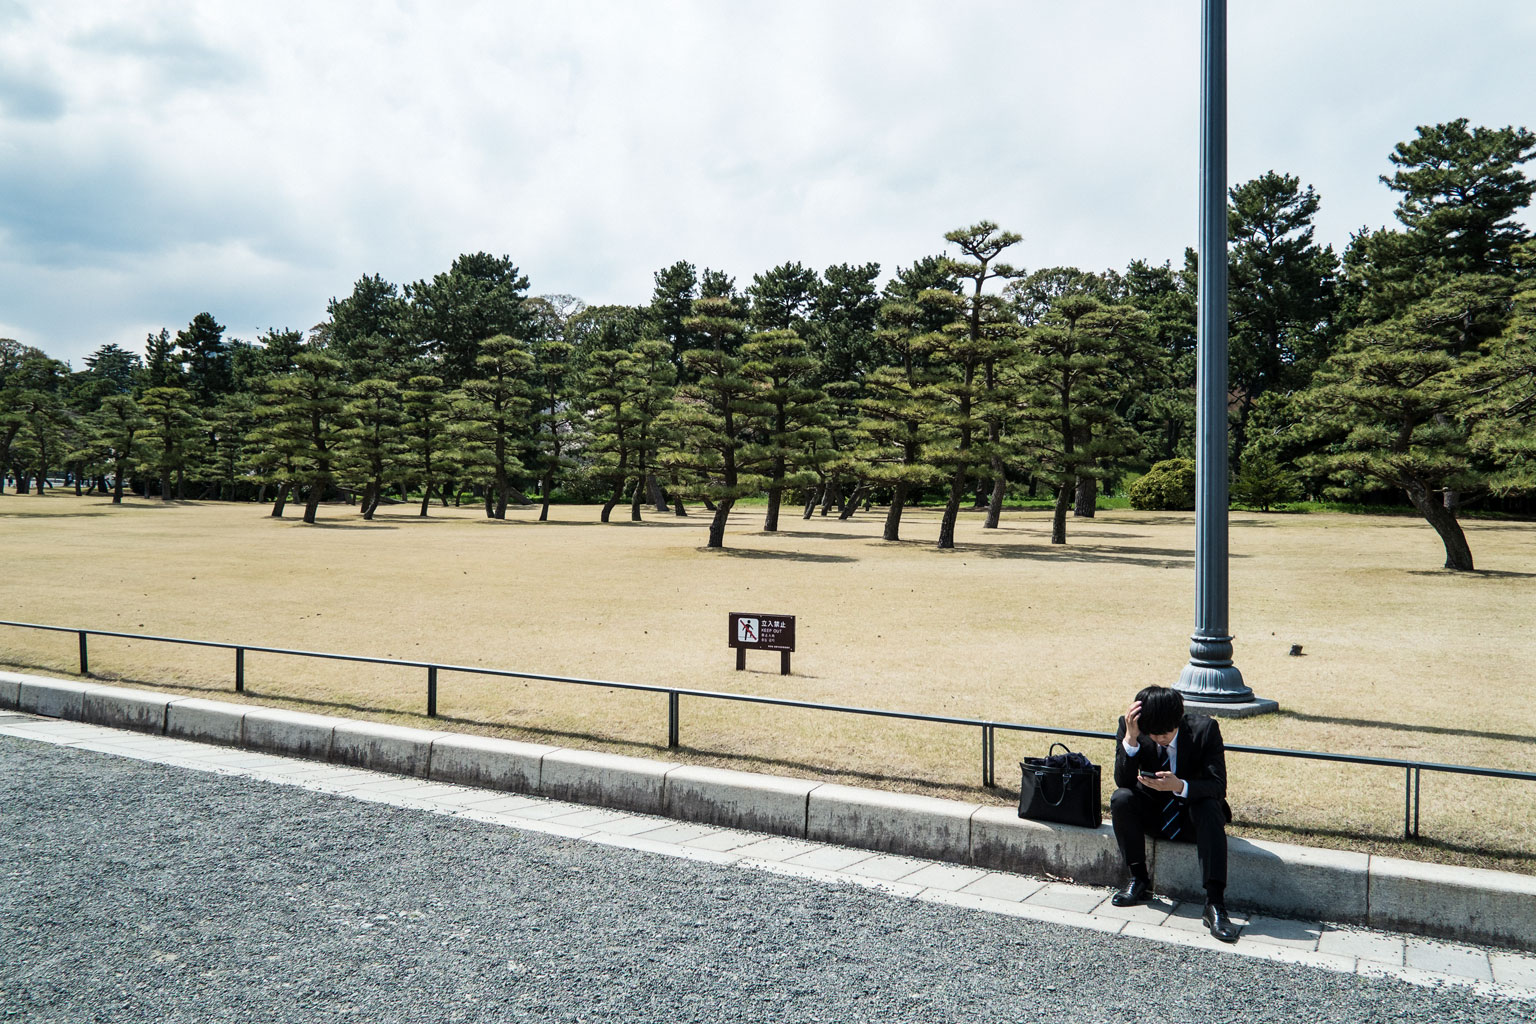 120407_PR_Japan_03_F09188.jpg